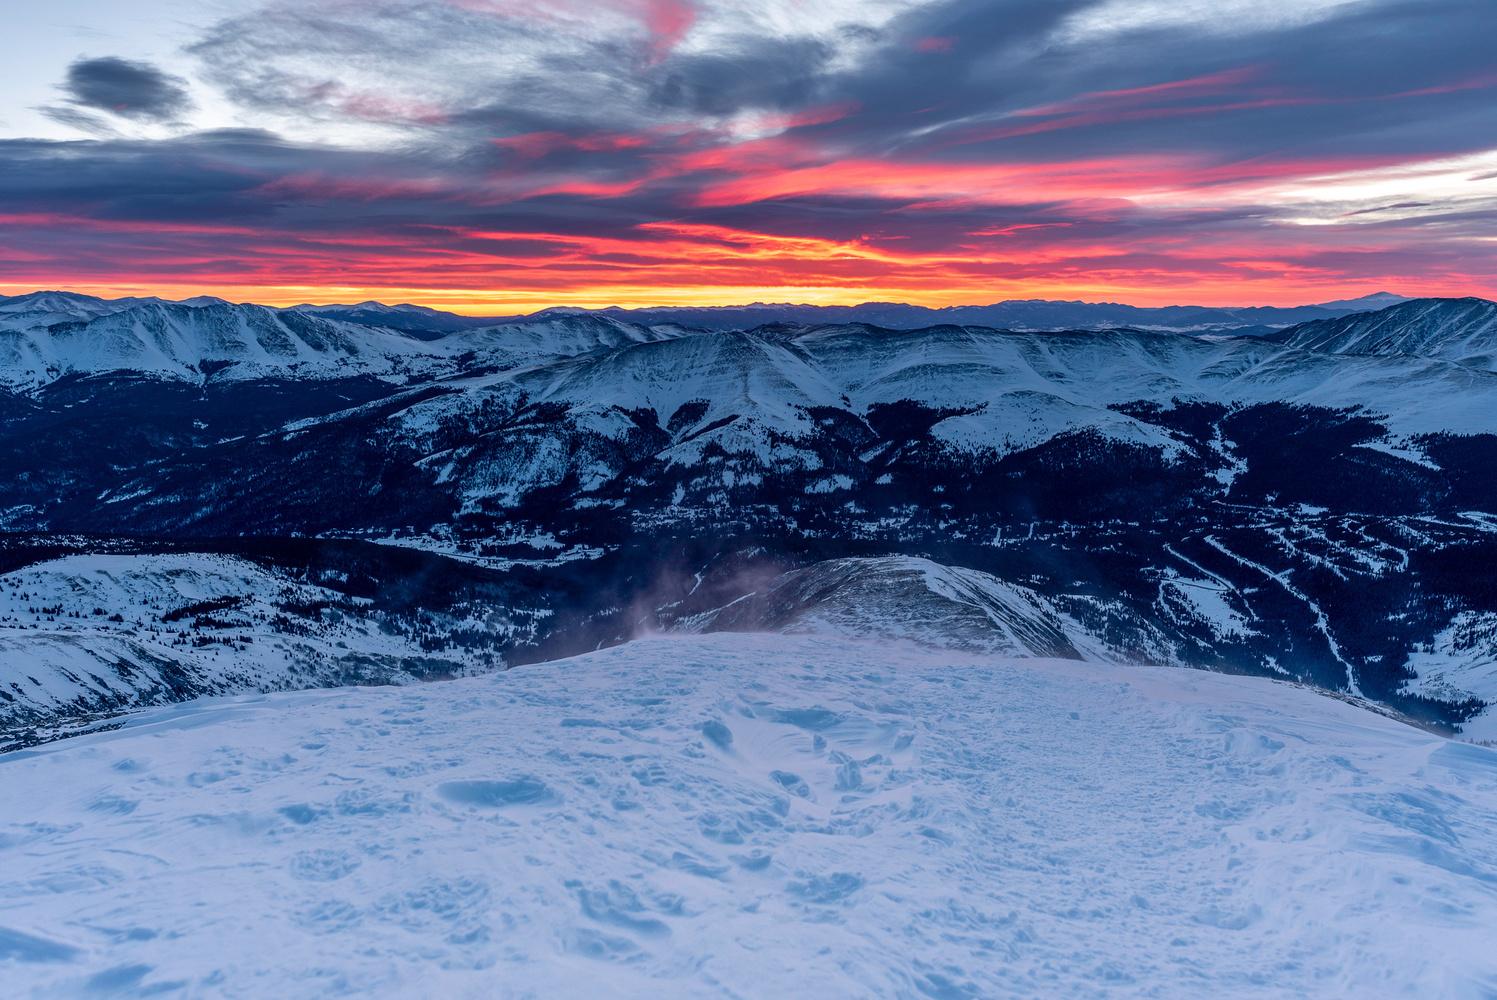 Summit Sunrise by Dave Spates